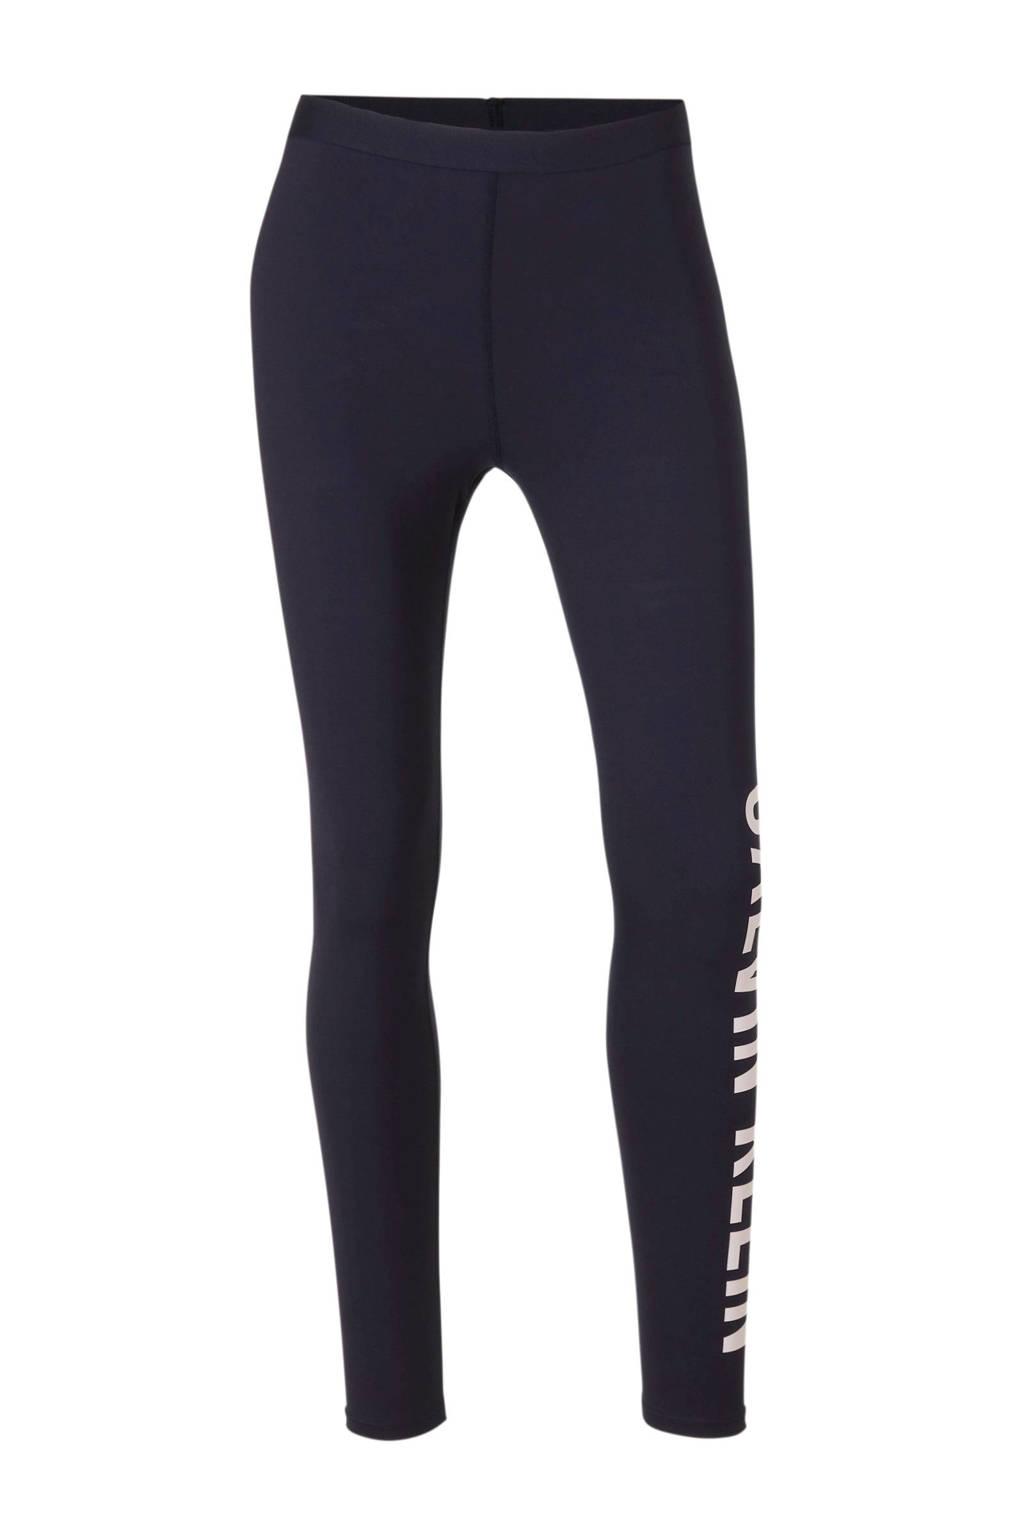 Calvin Klein Performance sportlegging donkerblauw, Donkerblauw/roze